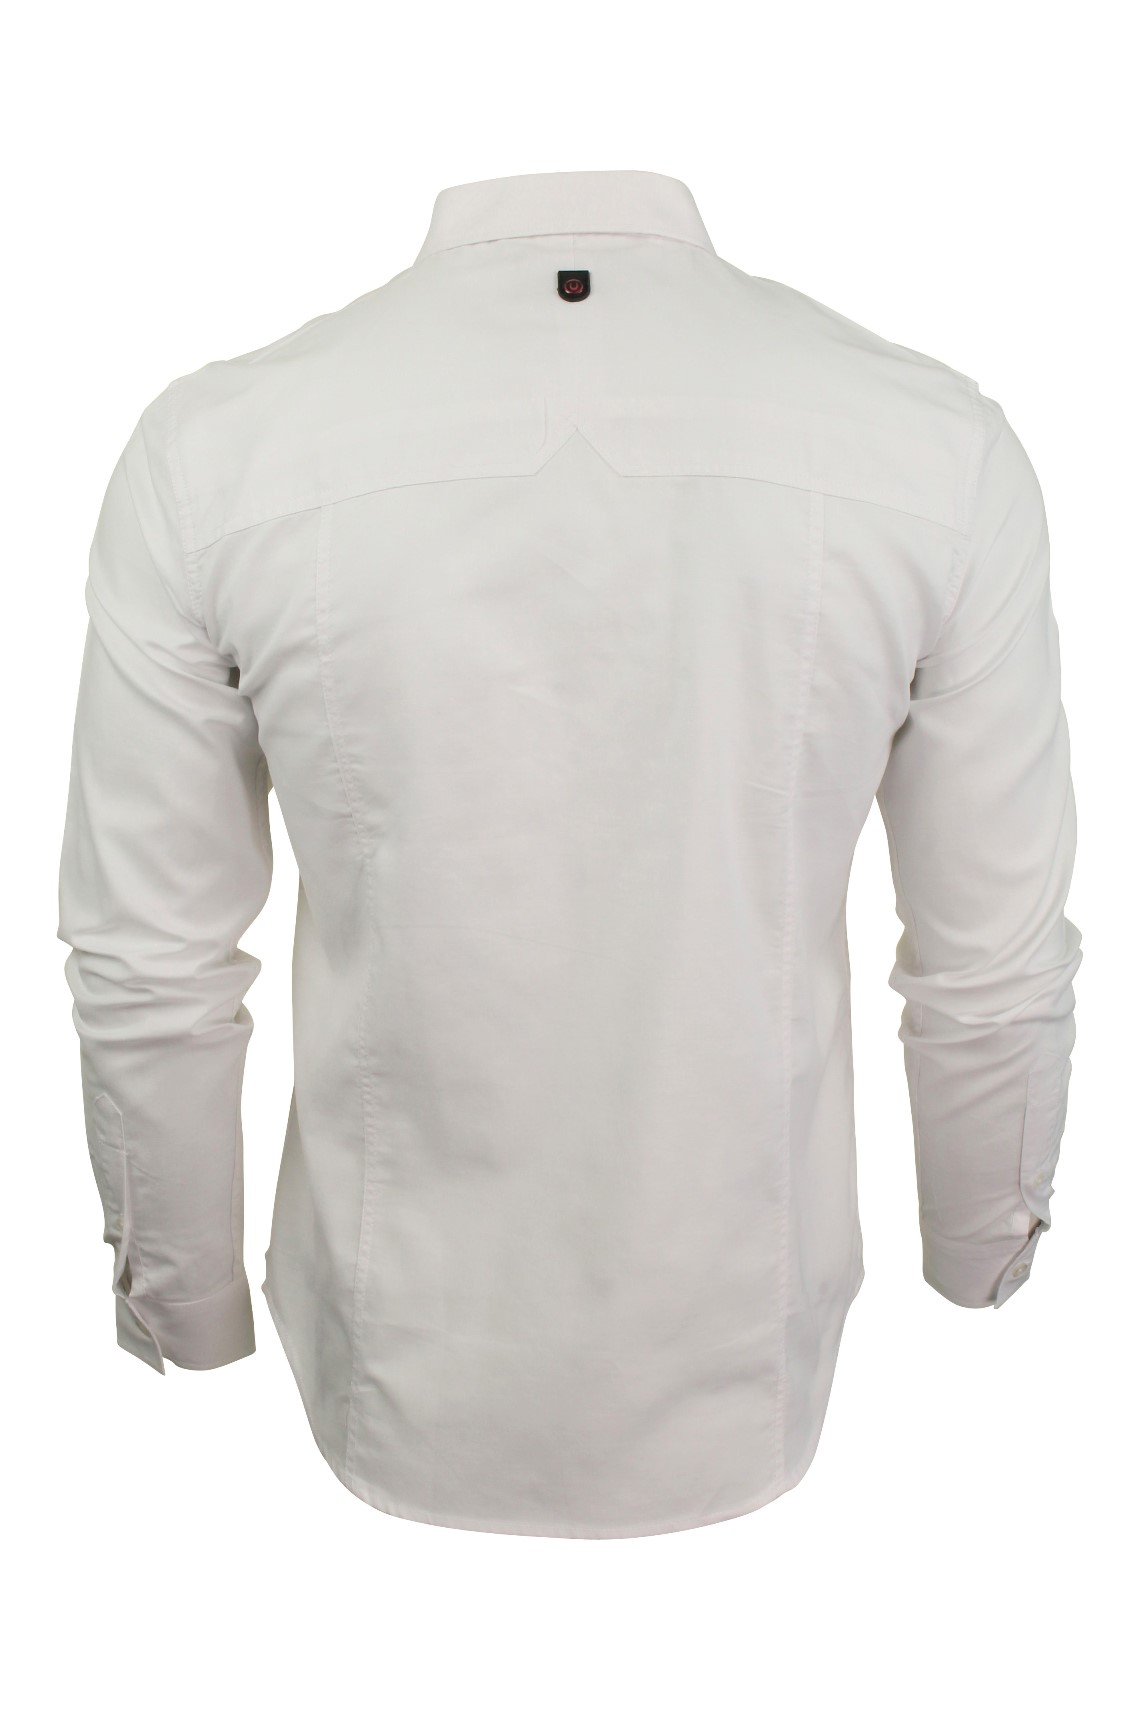 Para-hombres-camisa-de-manga-larga-por-Pato-Y-Cubierta-039-abedul-039 miniatura 14